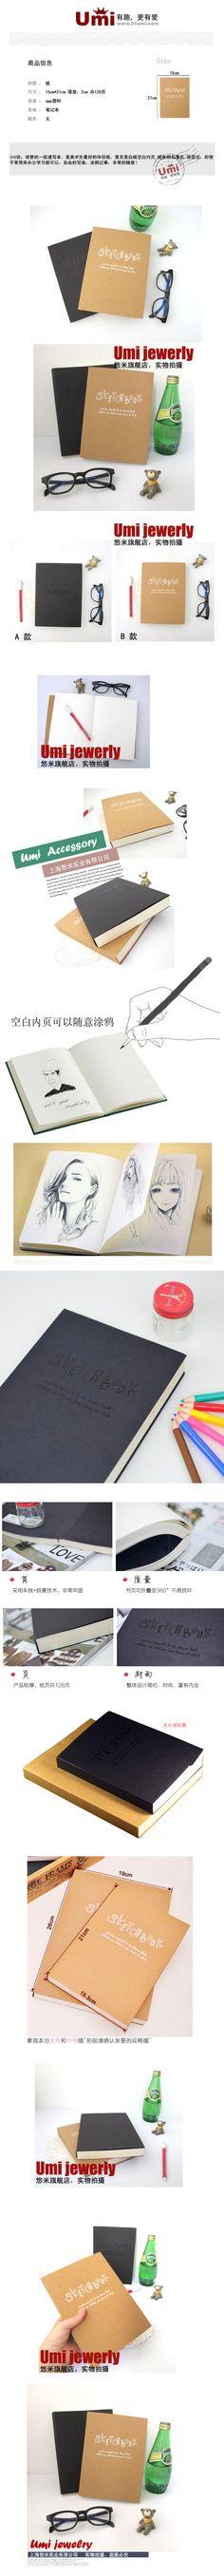 Umi stationery blank sketchblock notebook diary tsmip sketch book